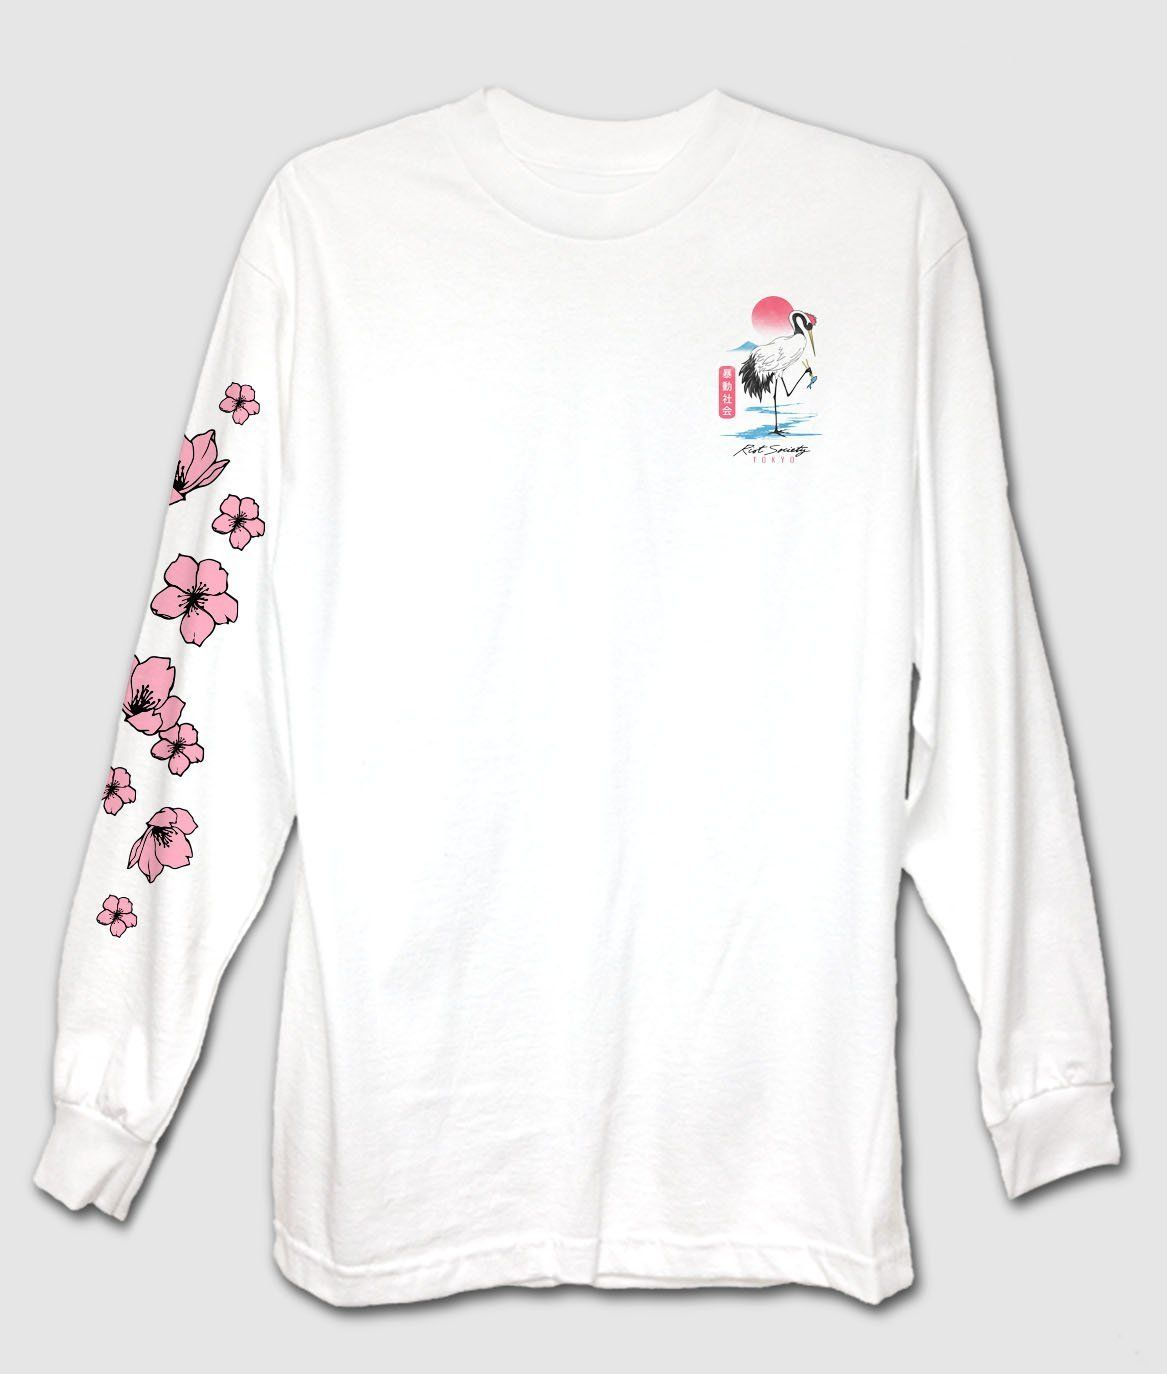 2a5483a4d549 Crane Tokyo Mens Long Sleeve T-Shirt in 2019 | Me love you long tee ...